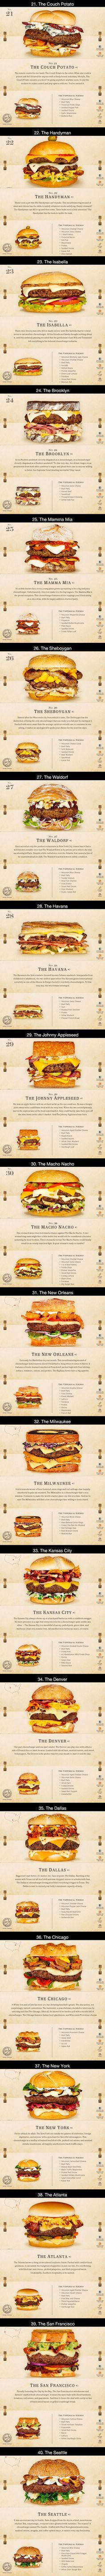 40 Glorious Burger Combinations Part 2 - 9GAG